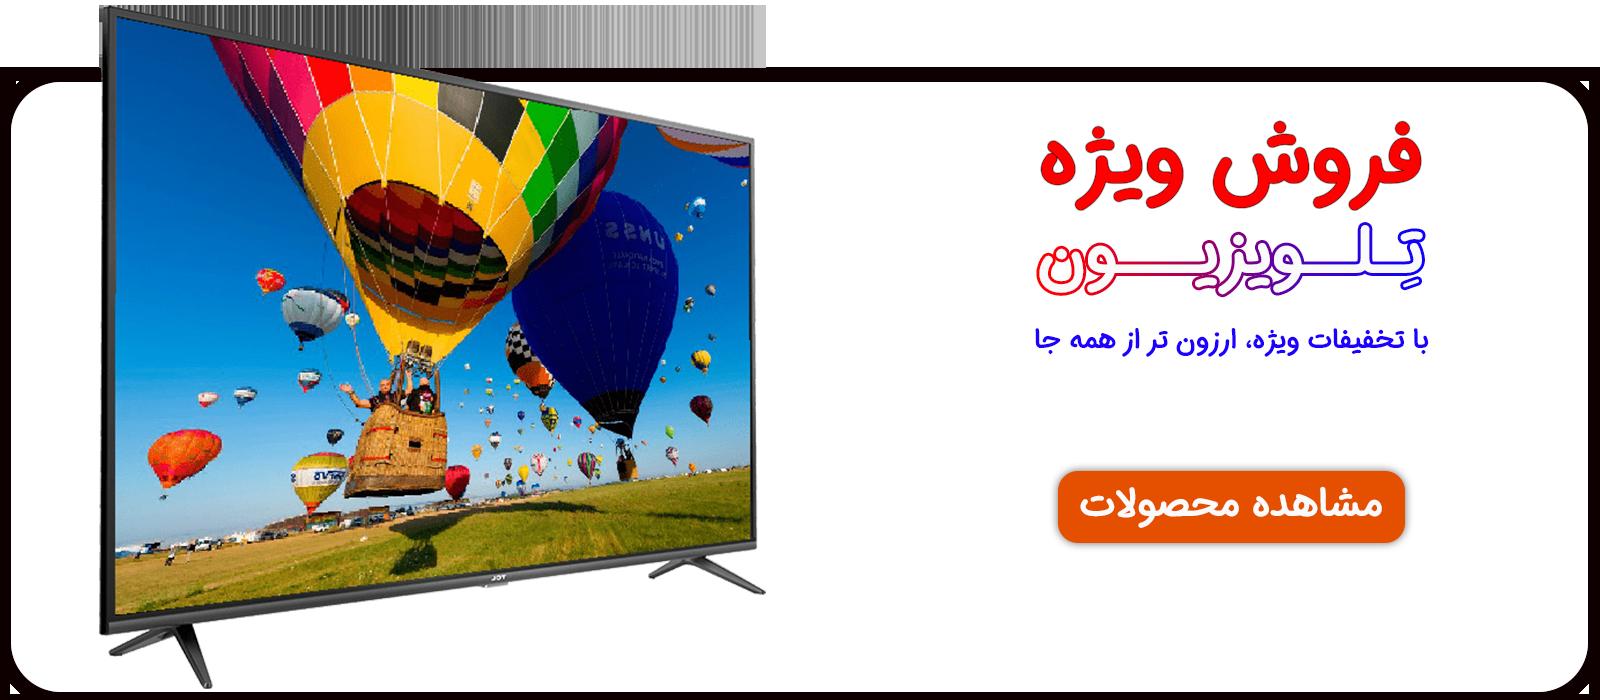 jijimoo.com-tv-off01-banner-1600x700